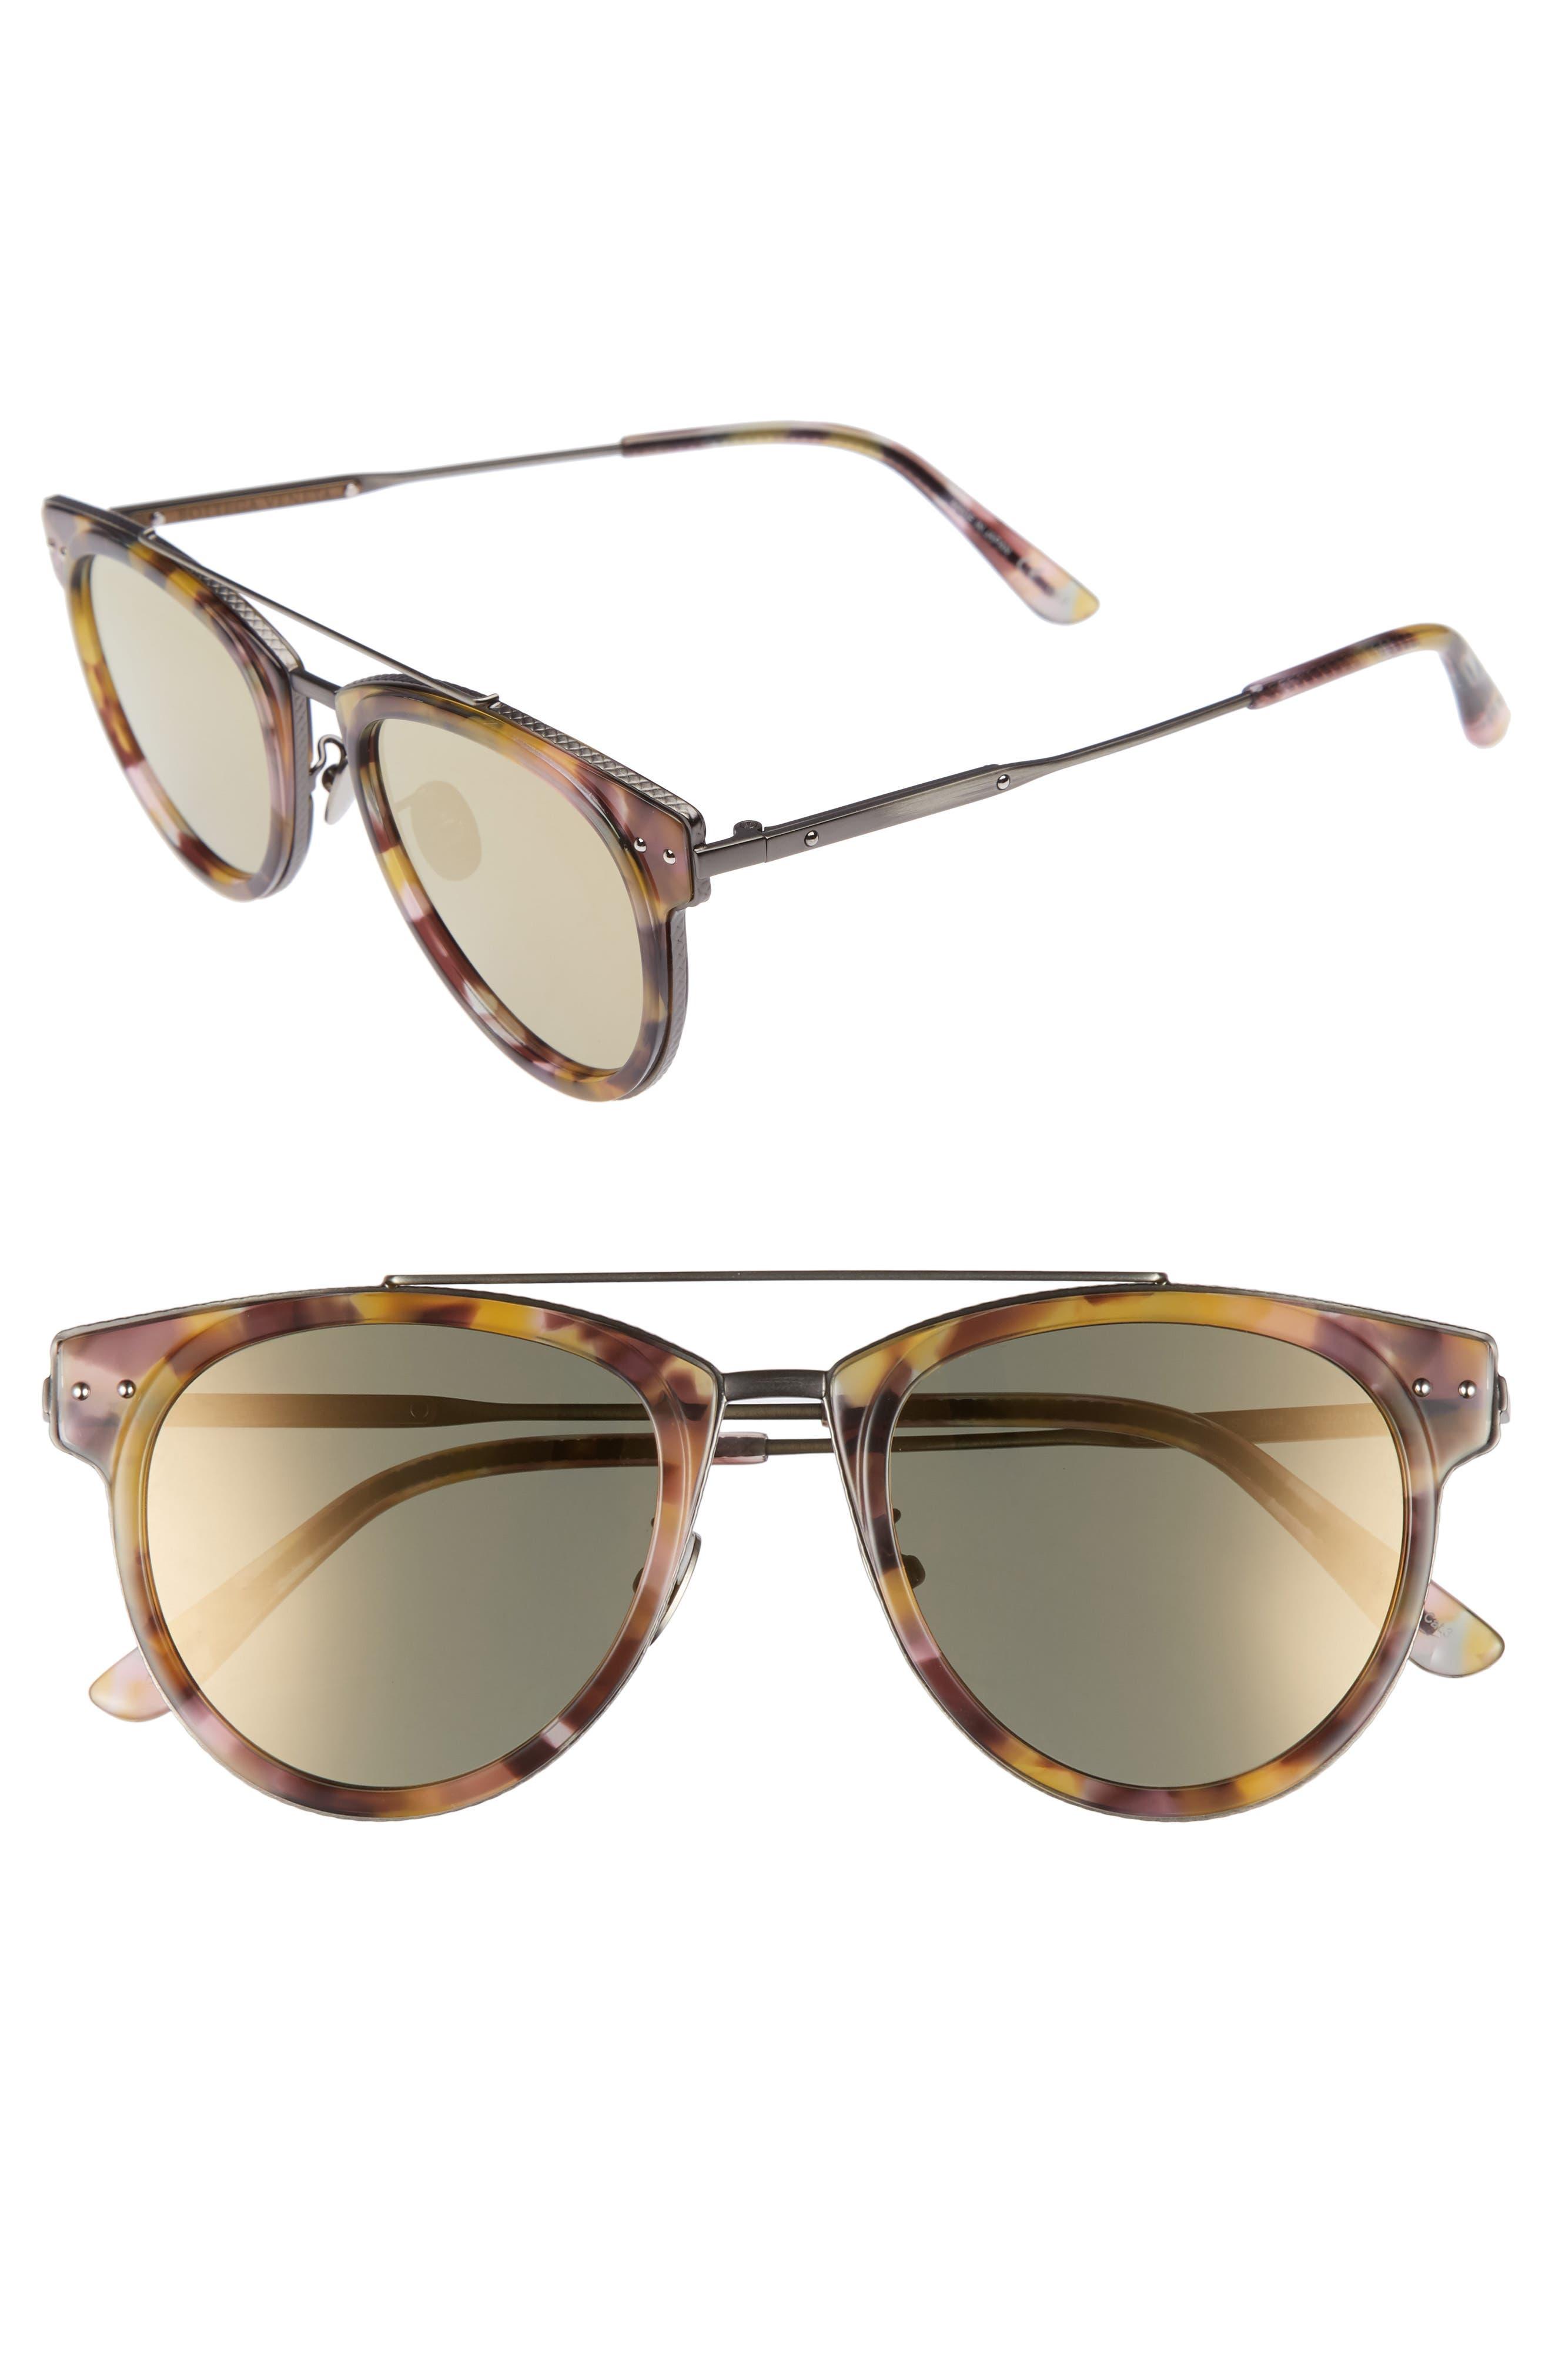 50mm Sunglasses,                         Main,                         color, AVANA BROWN